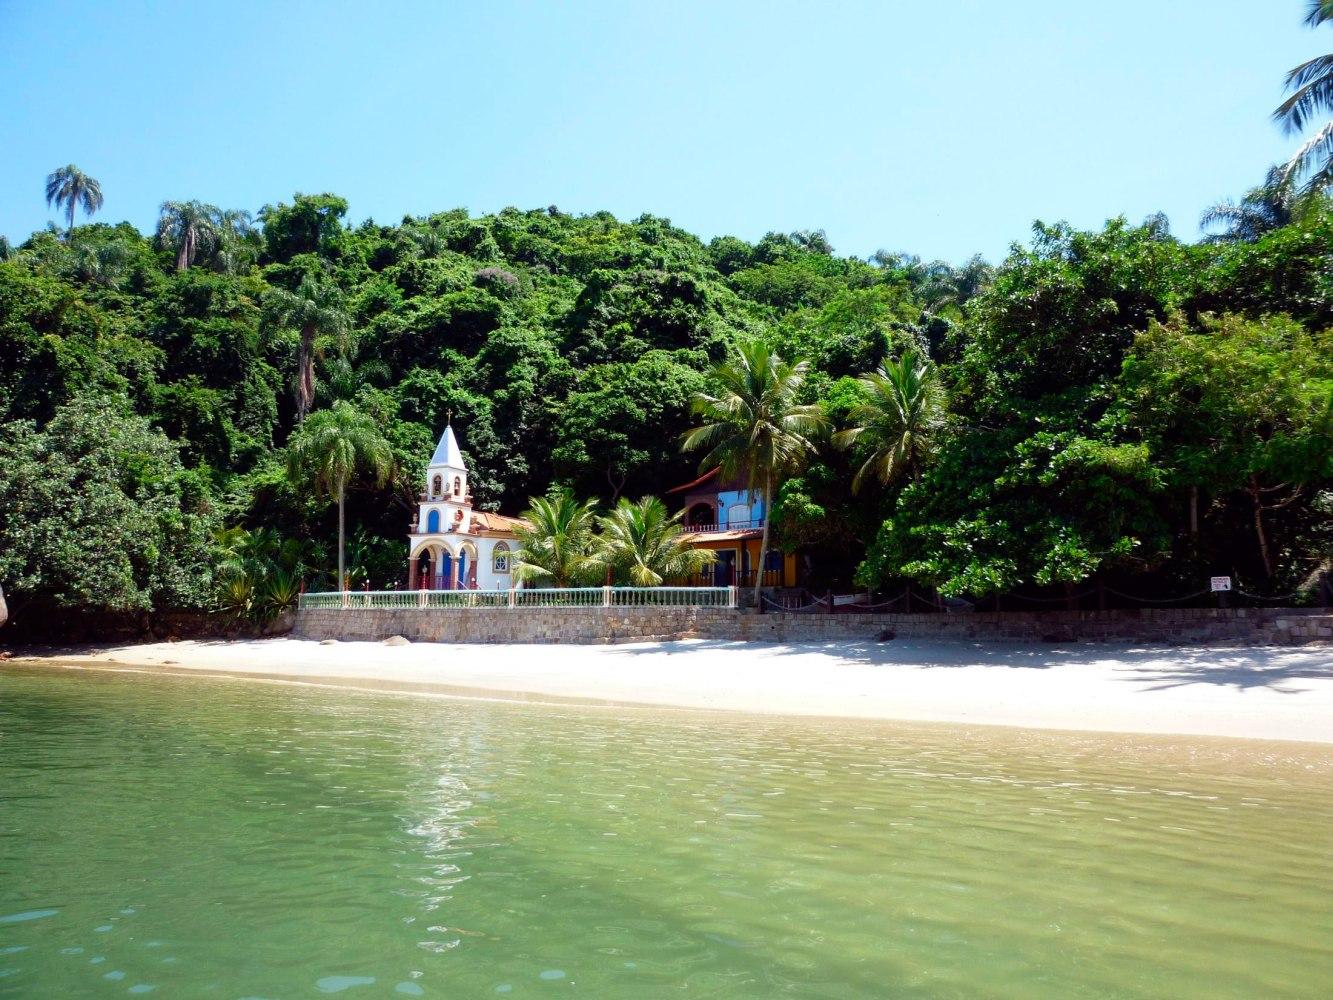 Islands Restaurant New Locations